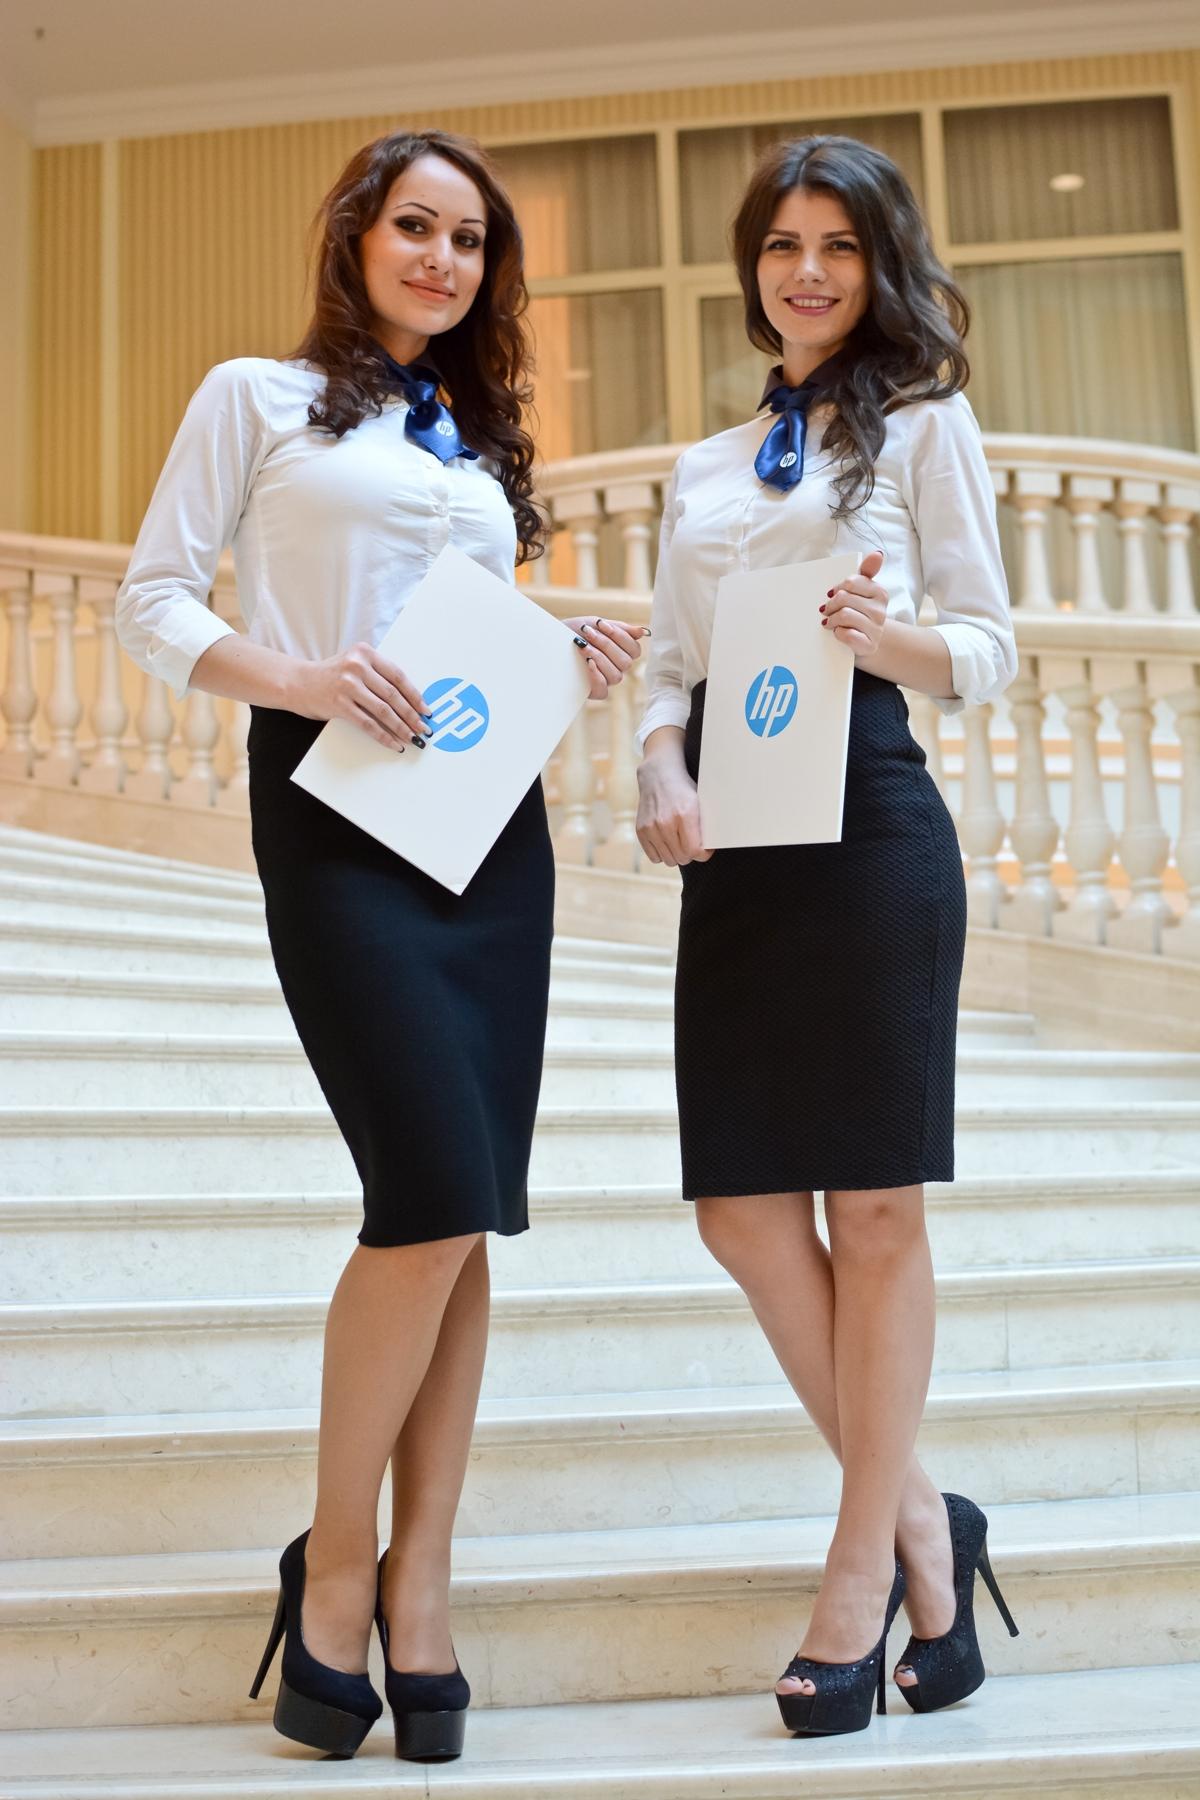 Hostess+Bucuresti+(2).JPG